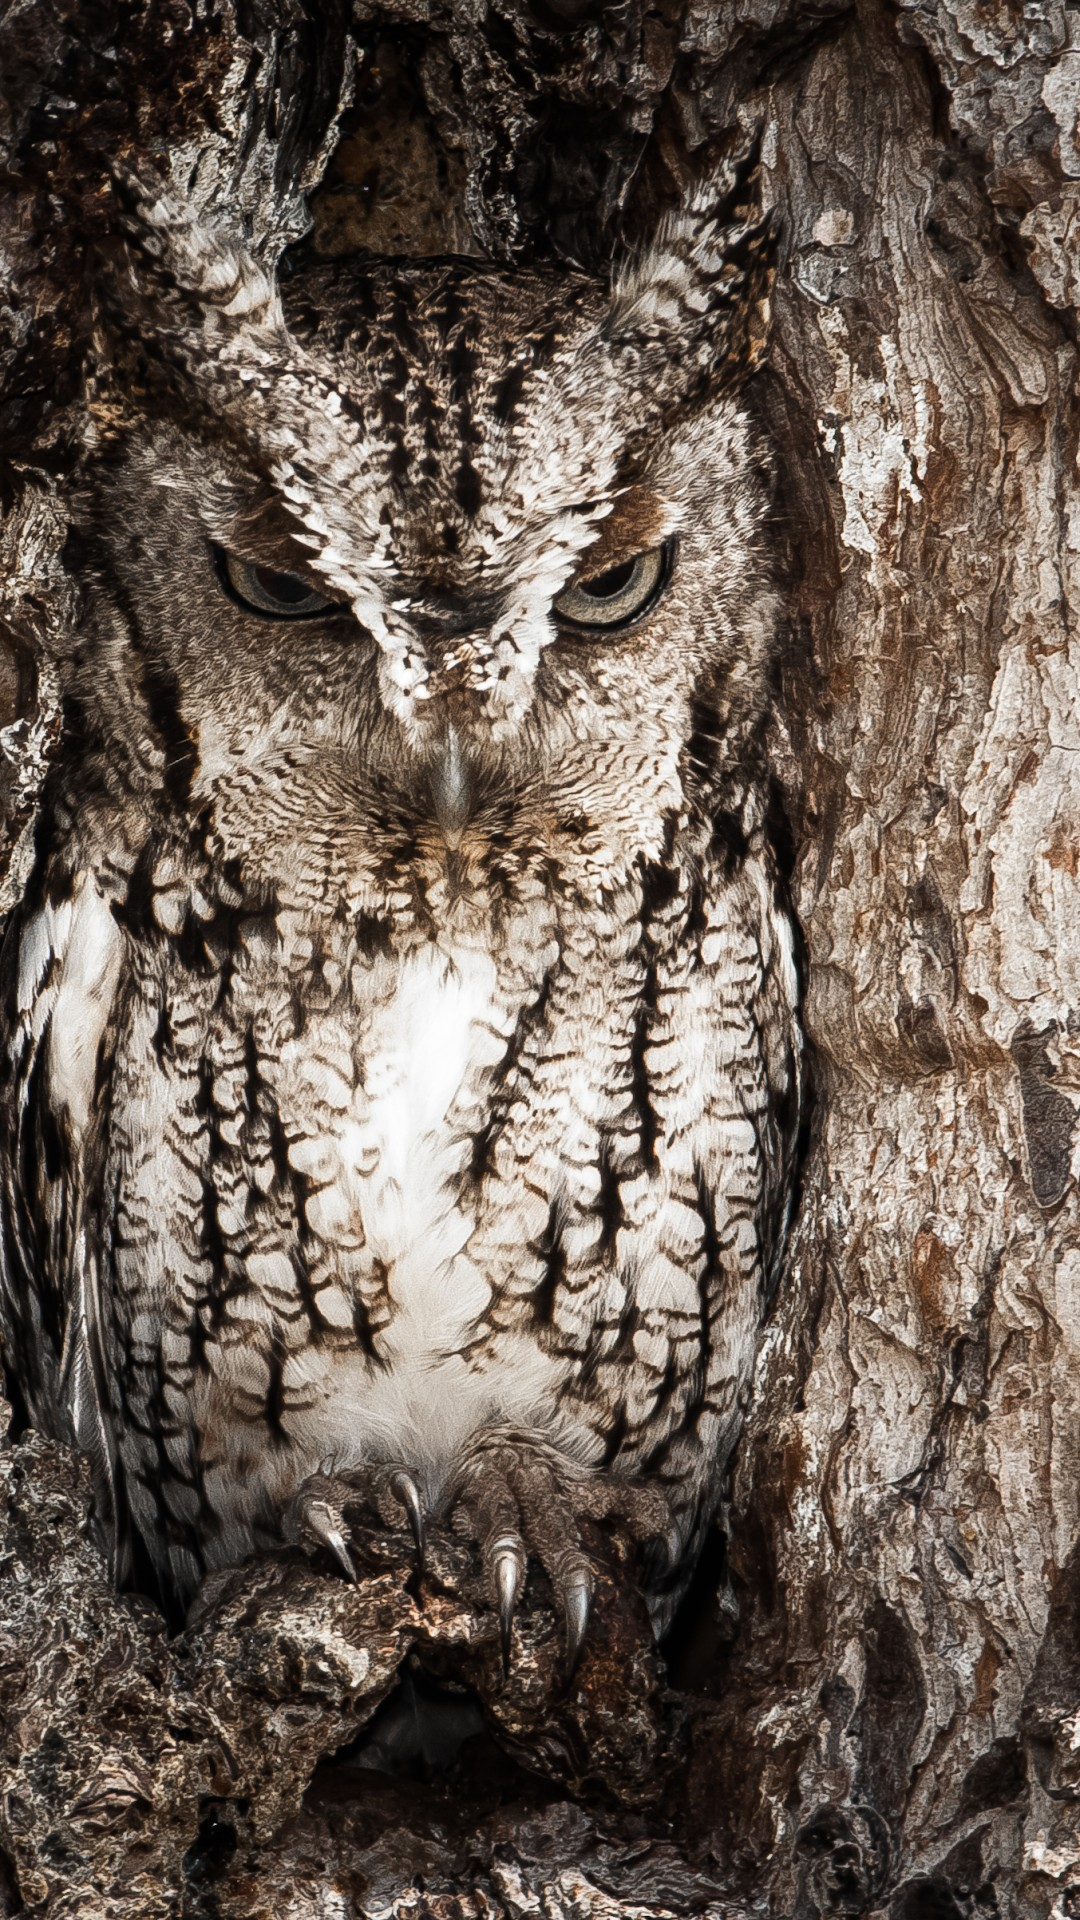 wallpaper national geographic 4k hd wallpaper owl